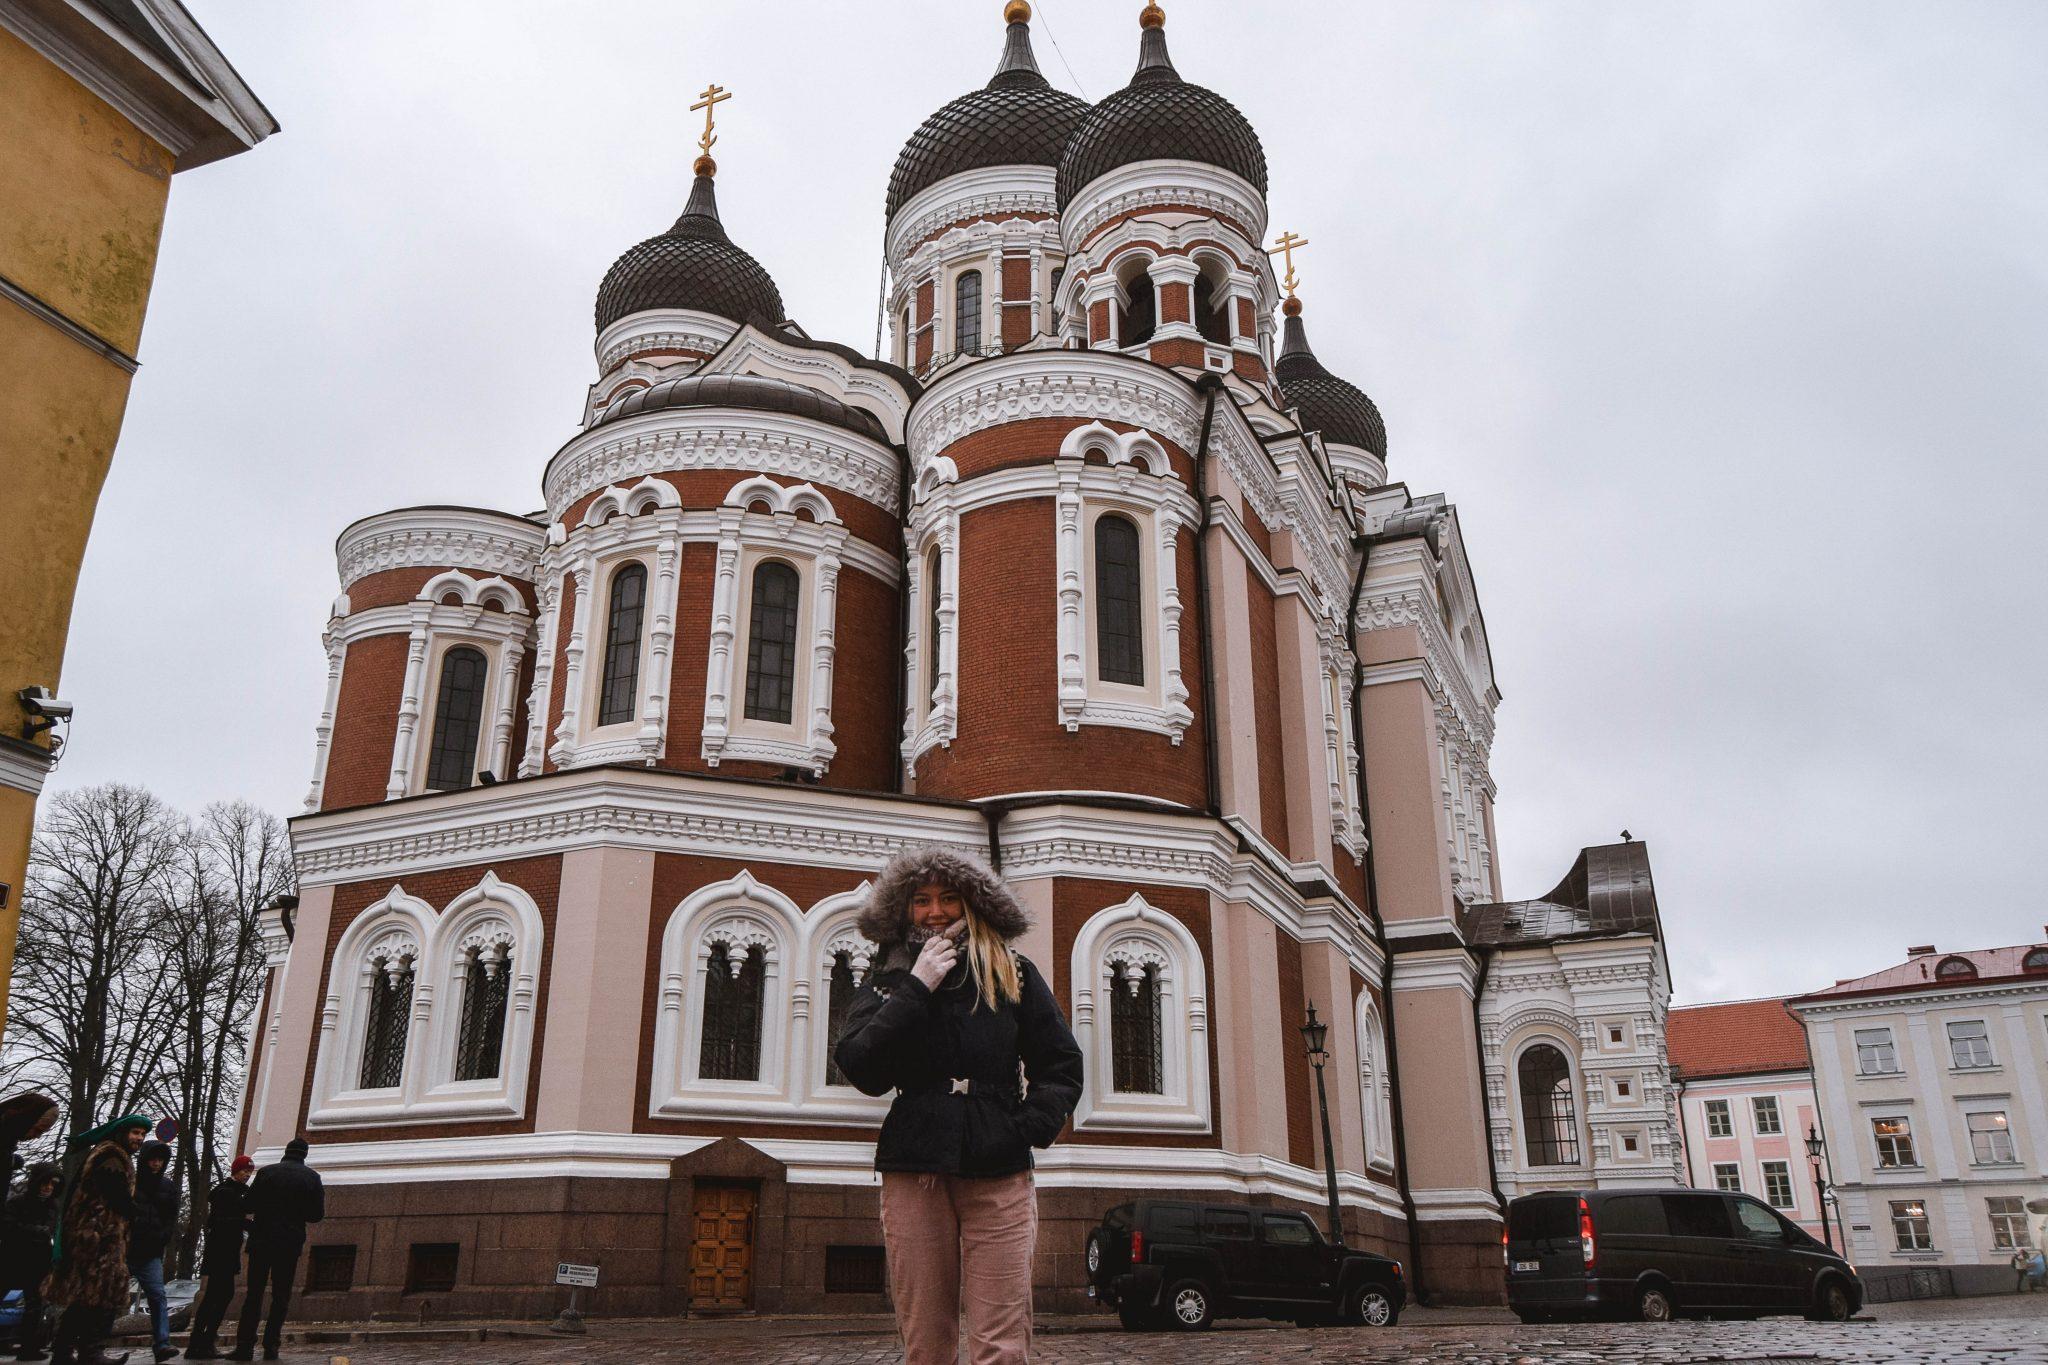 Things To Do In Tallinn In Winter Tallinn Things To Do - Alexandrer Nevsky Cathedral Tallinn Estonia